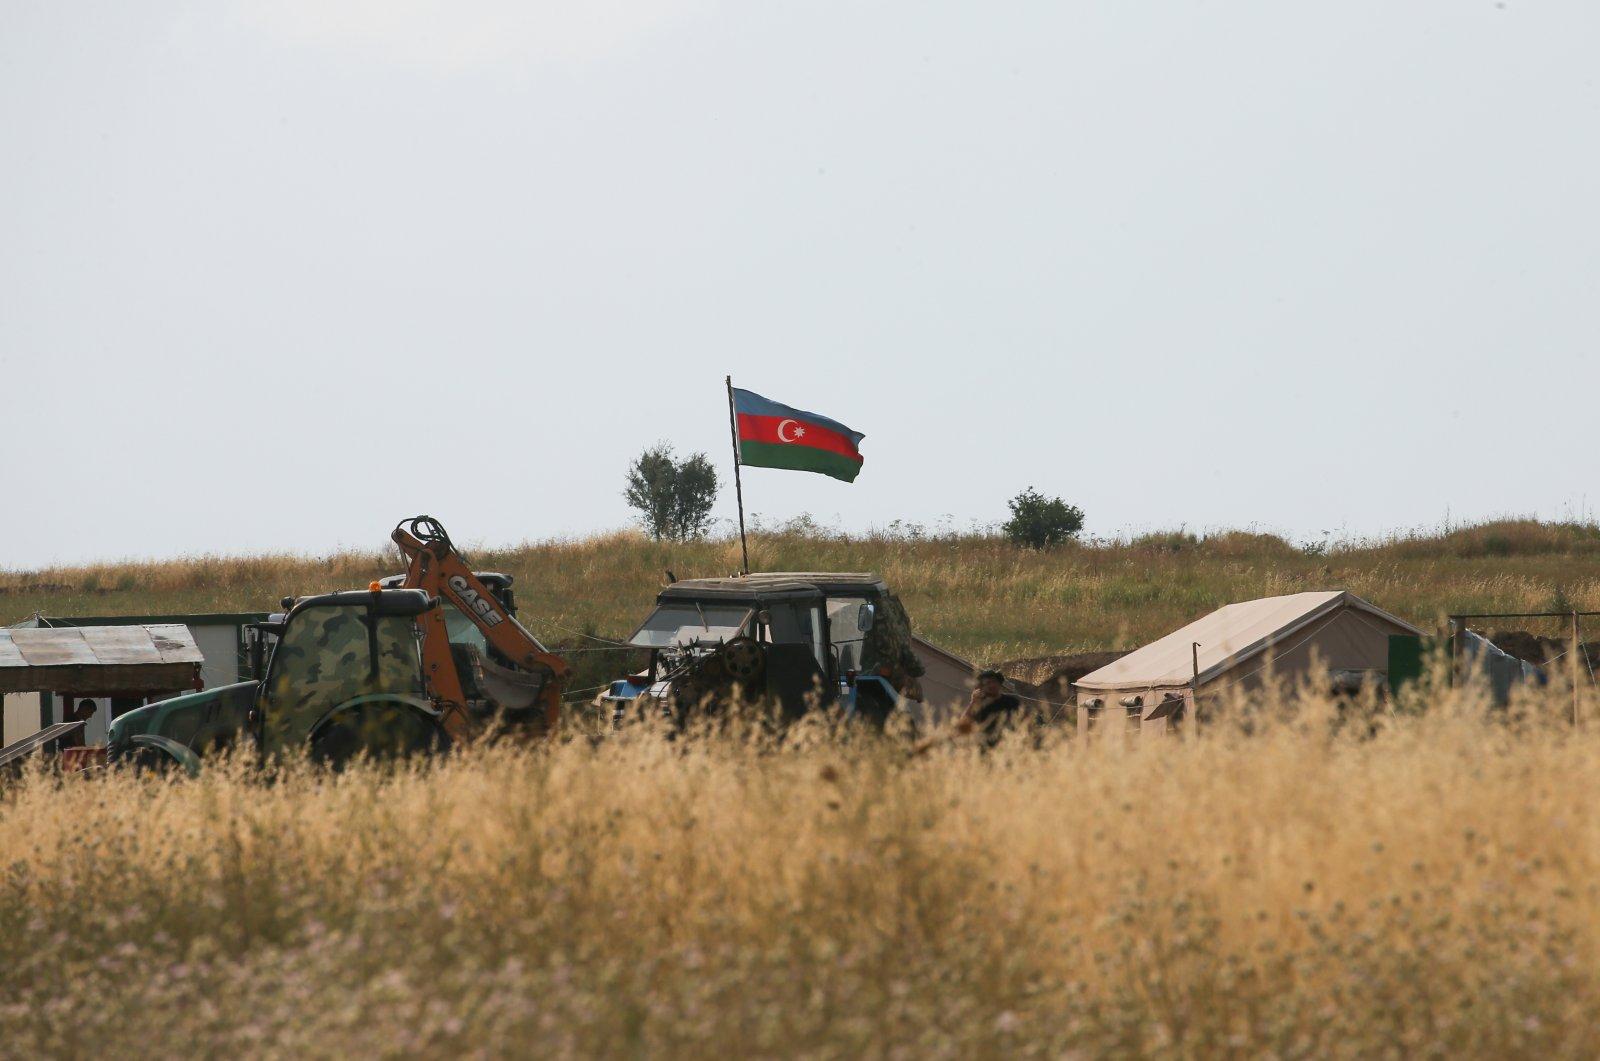 An Azerbaijani military checkpoint at the line of contact on the Azerbaijani-Armenian border, Qudabli, Azerbaijan, July 3, 2021. (Photo by Getty Images)